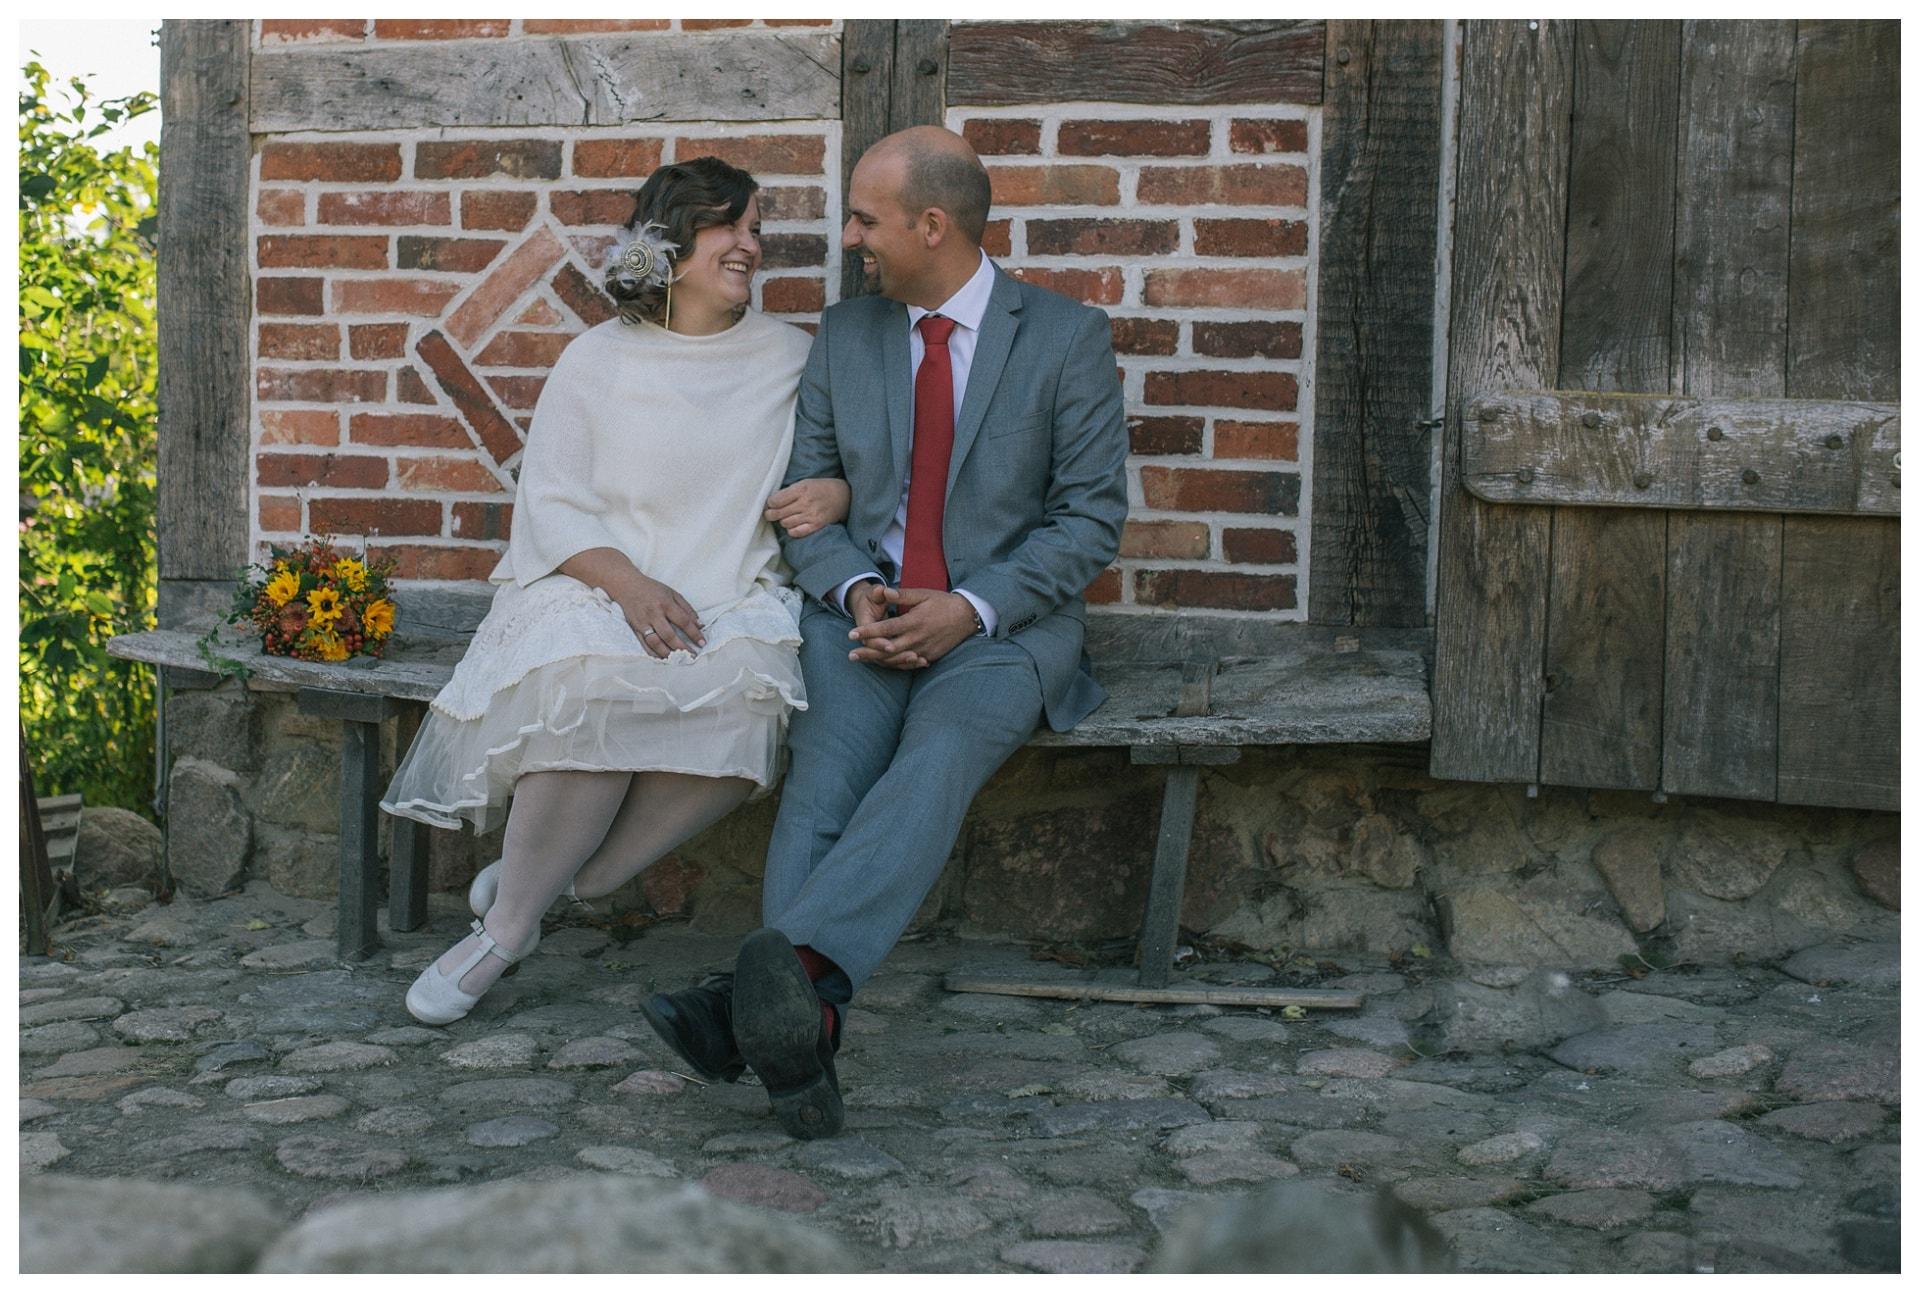 Hochzeitsfots Lübeck Hochzeitsfotograf Thomas Lüttig